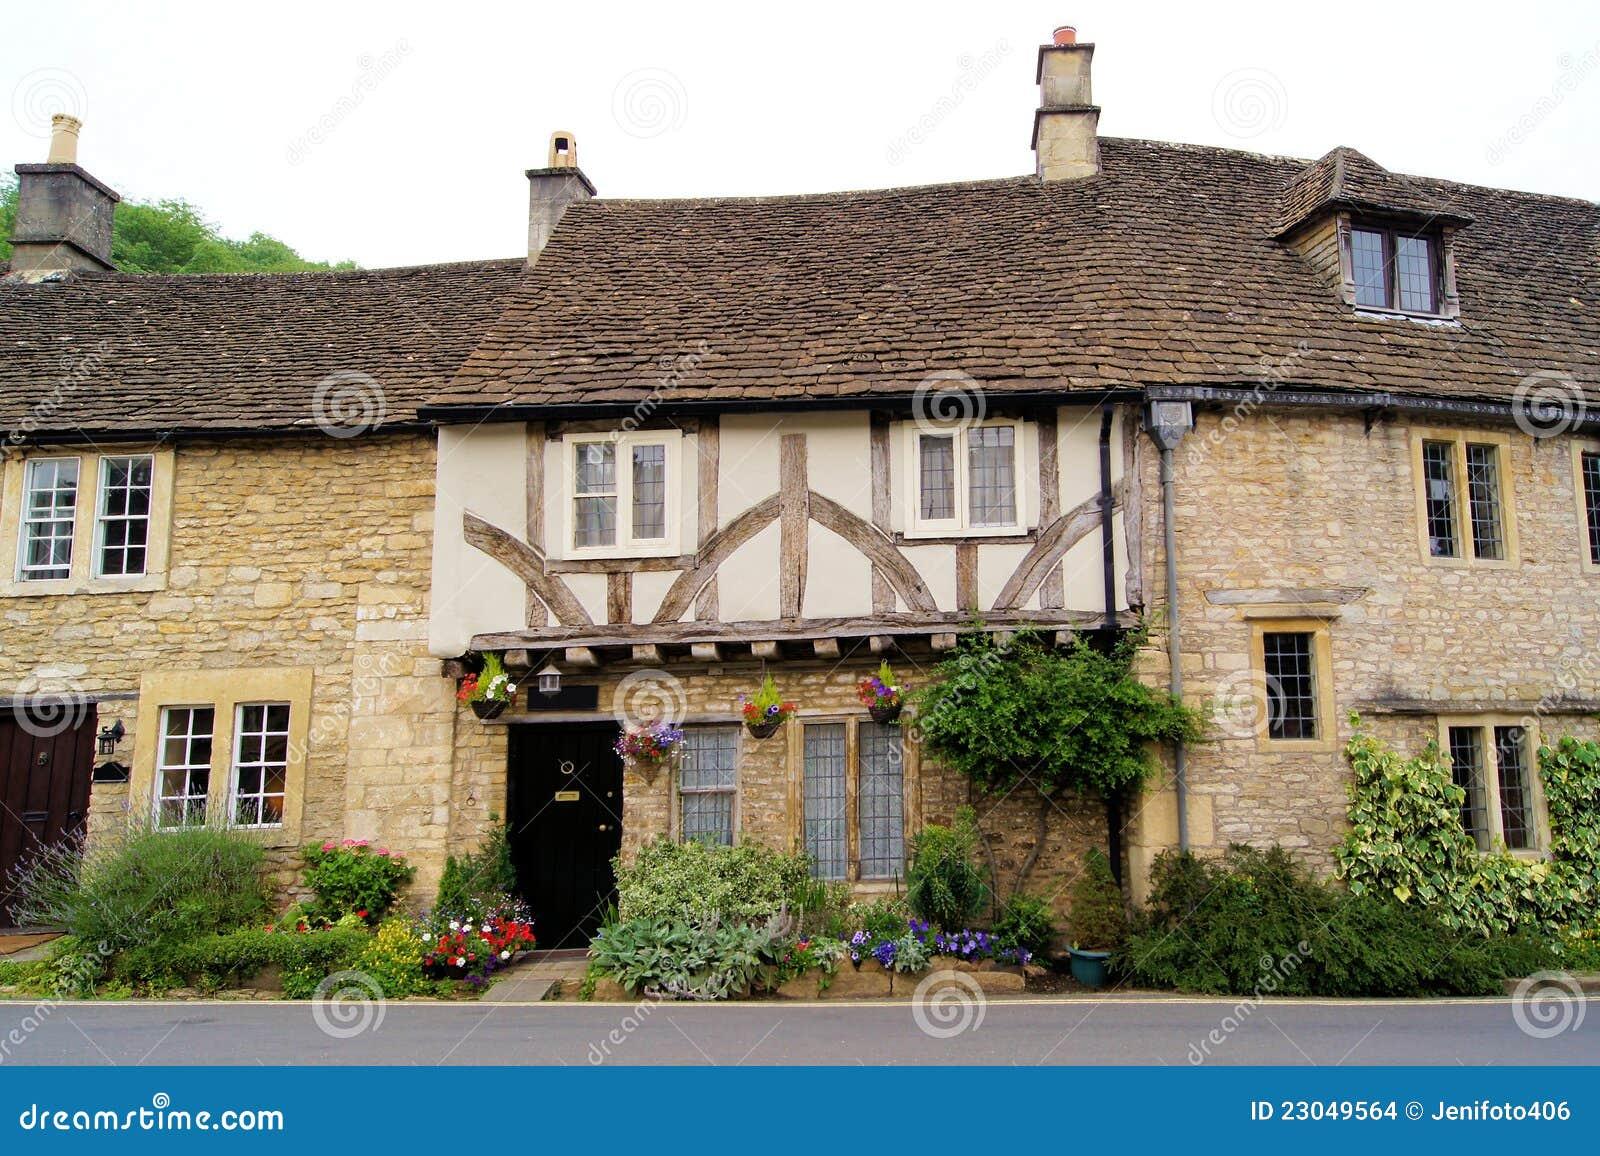 Casas inglesas foto de stock imagem de pista home potted 23049564 - Imagenes de casas inglesas ...